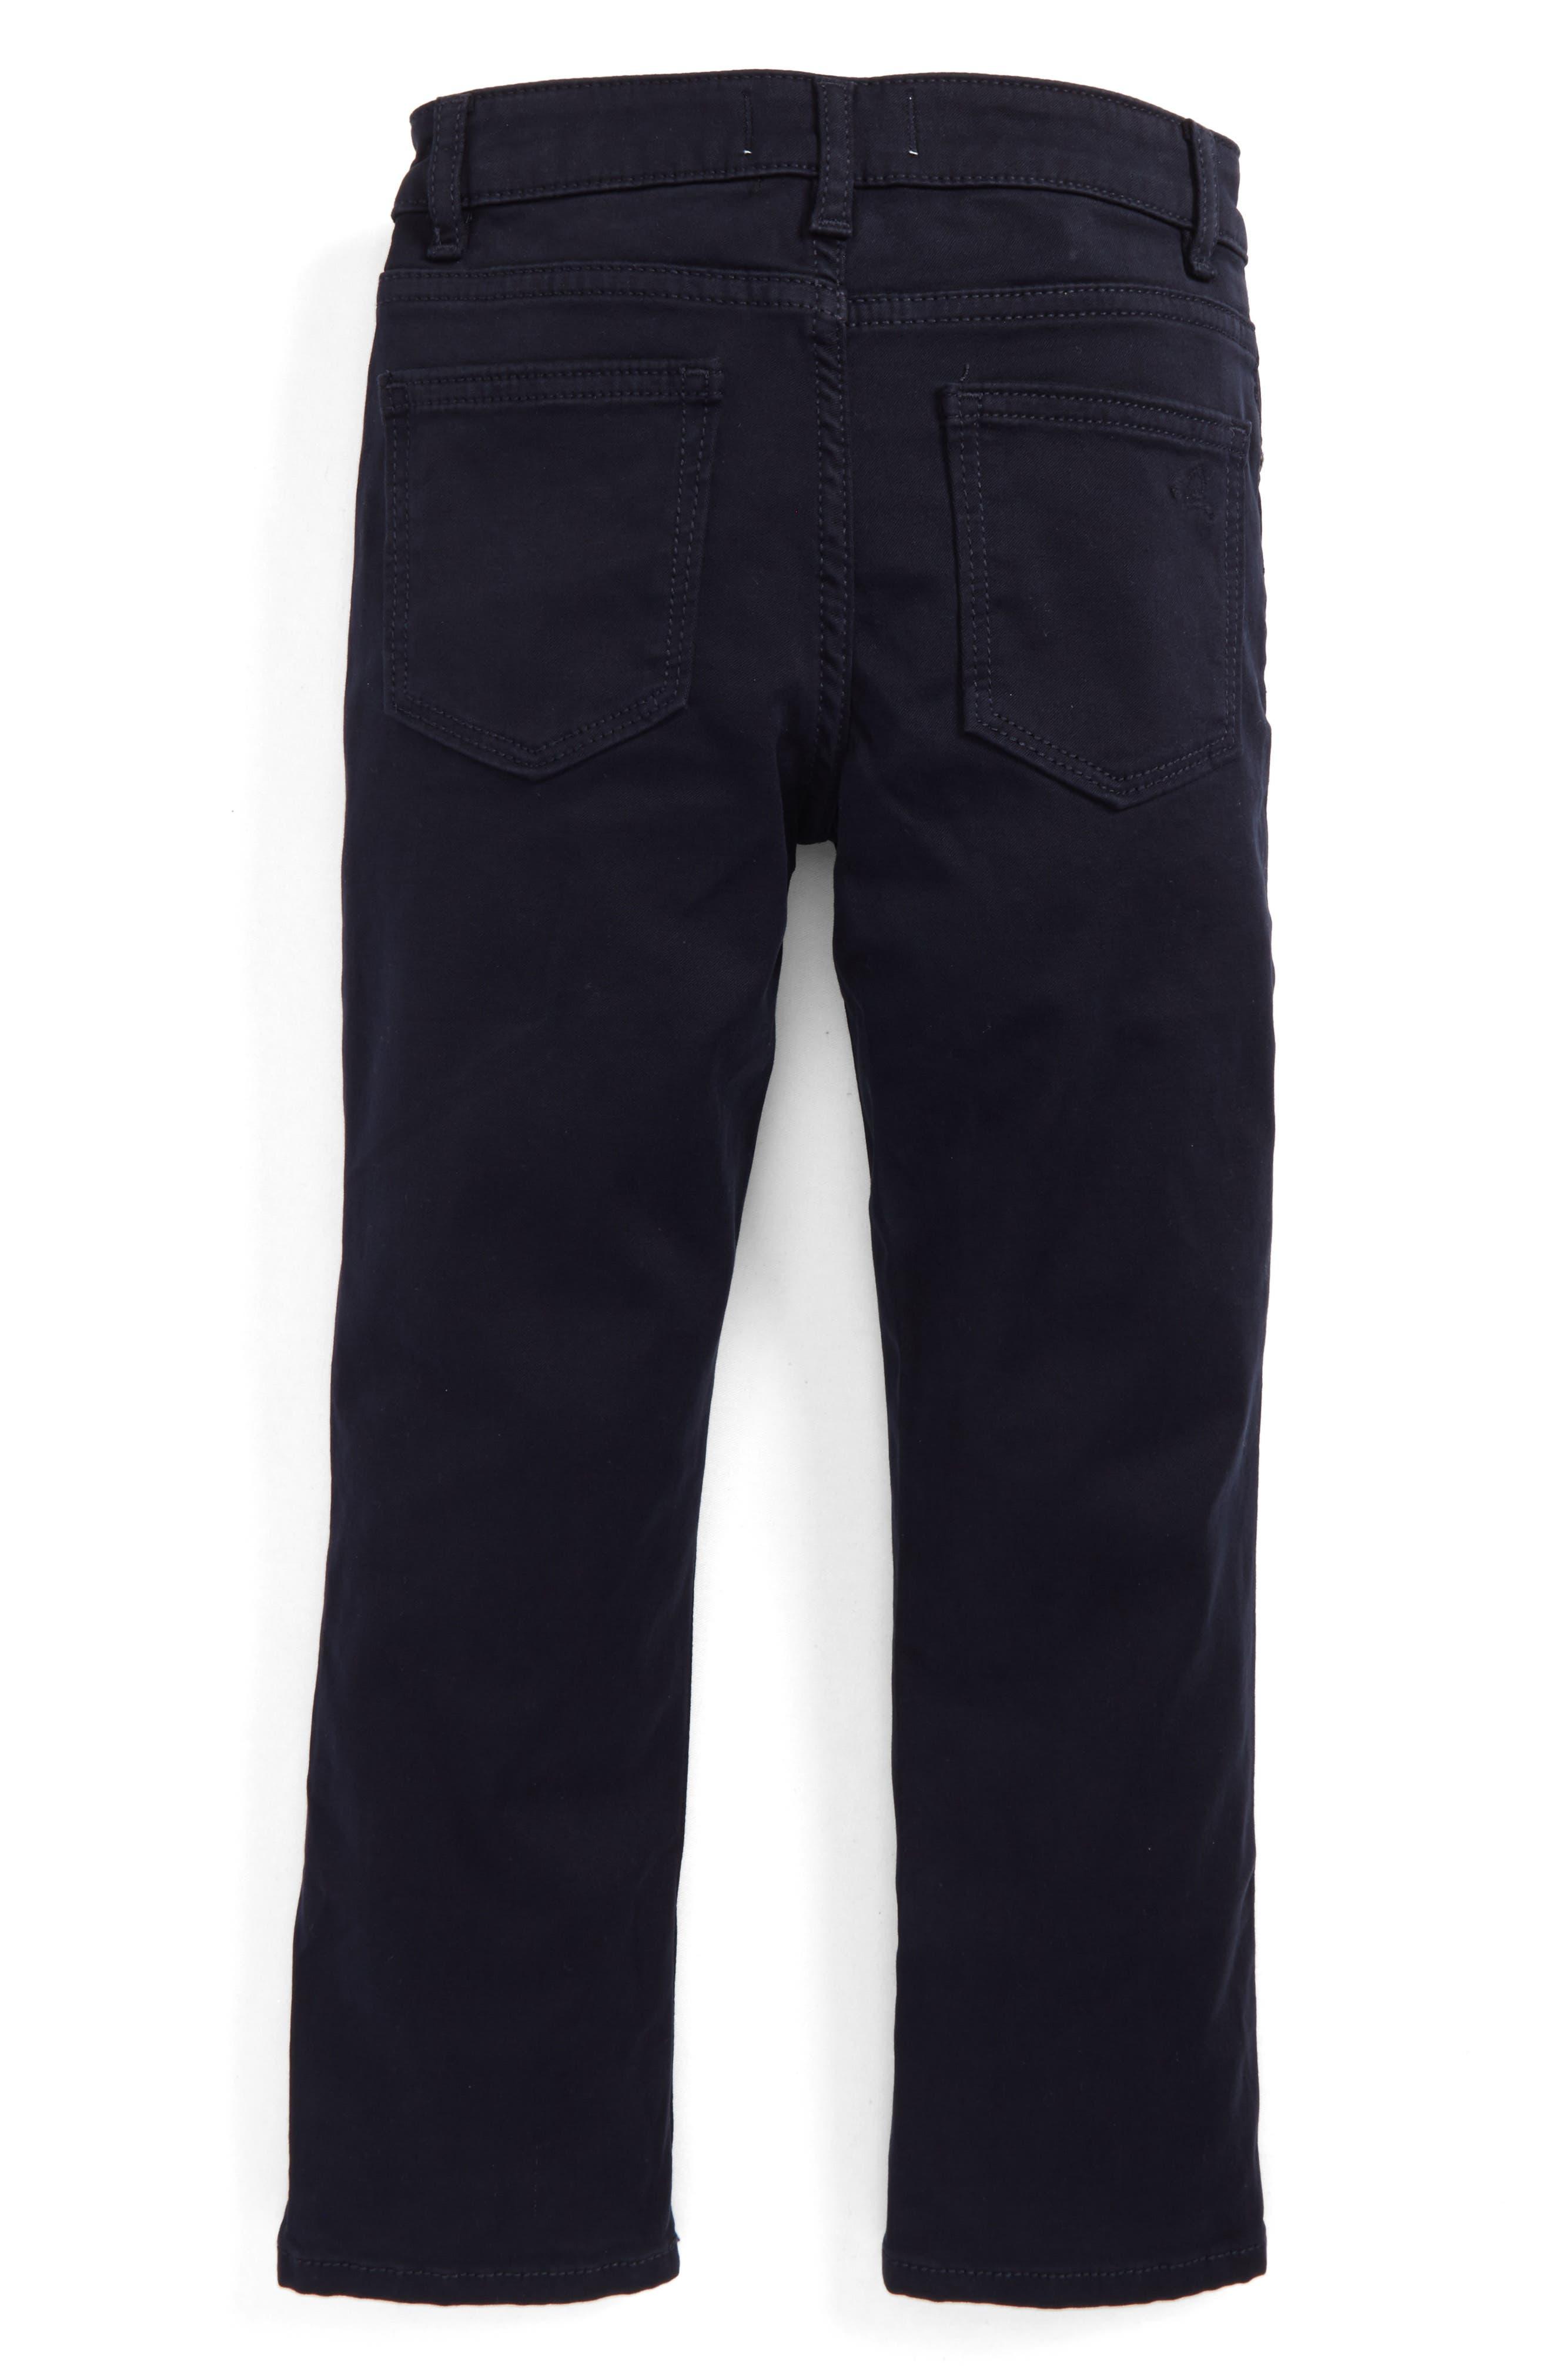 Brady Slim Fit Twill Pants,                             Alternate thumbnail 2, color,                             410